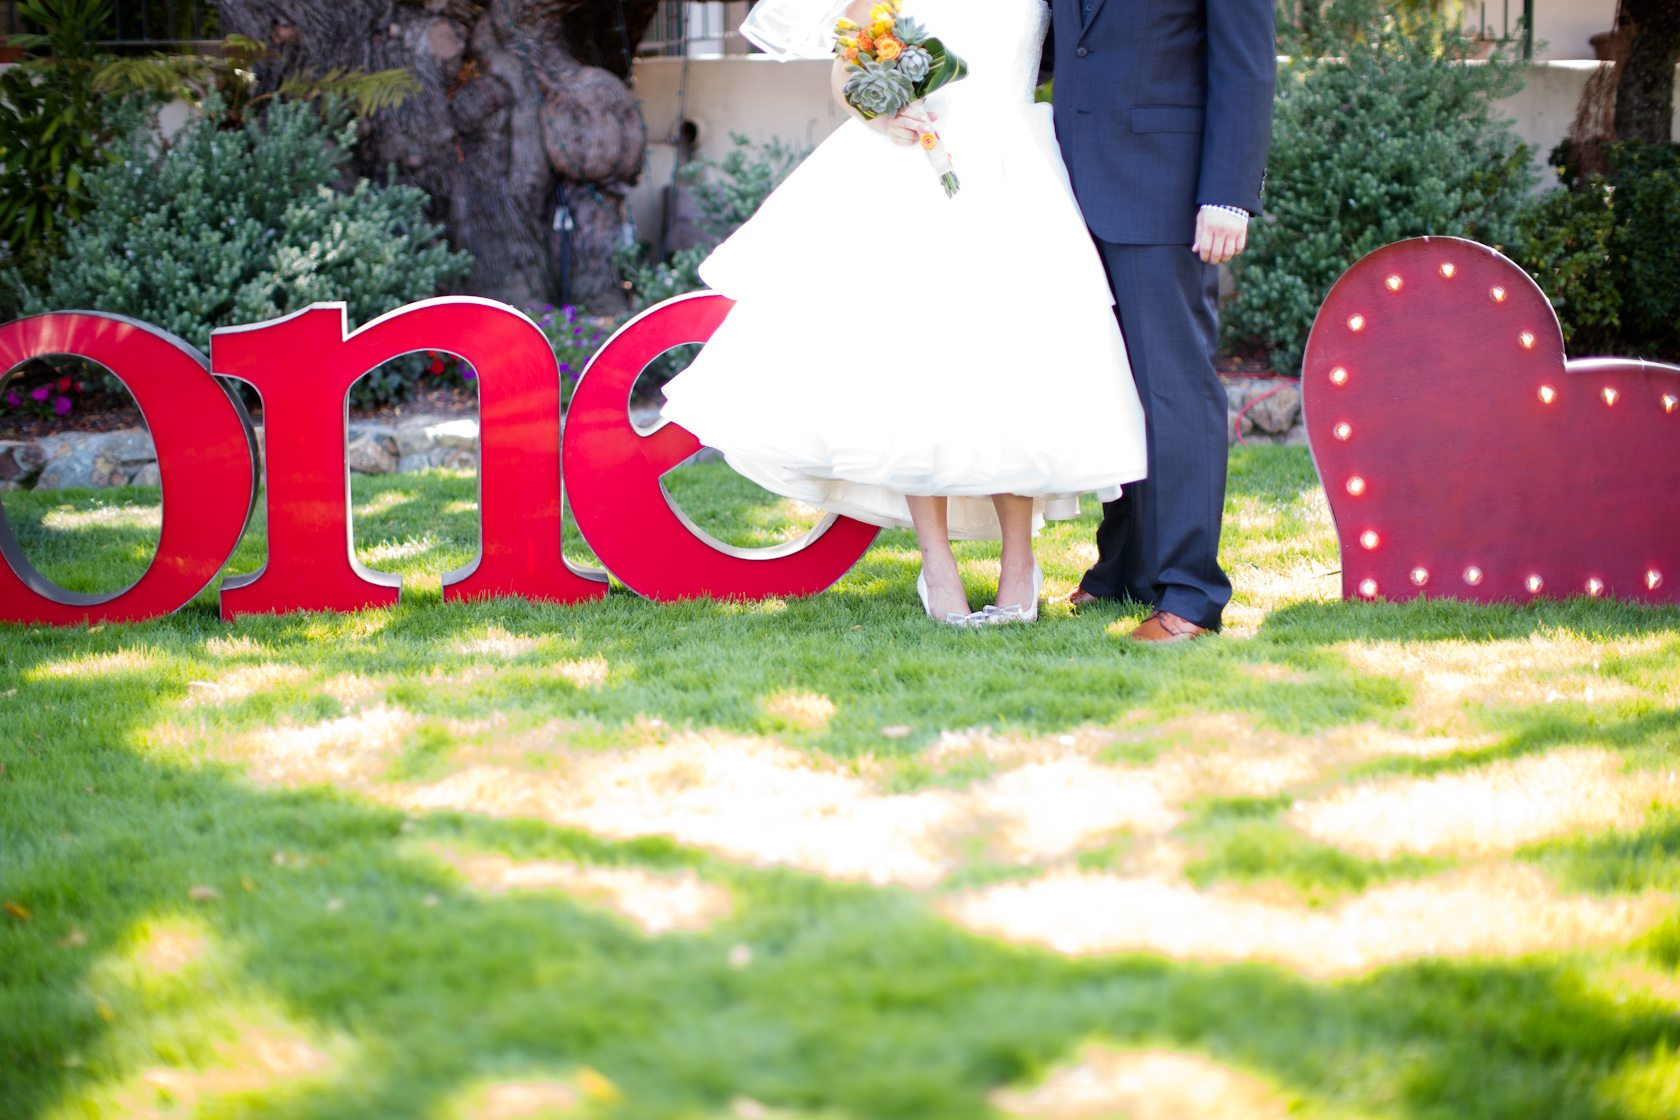 Rancho_Santa_Fe_Inn_09.jpg